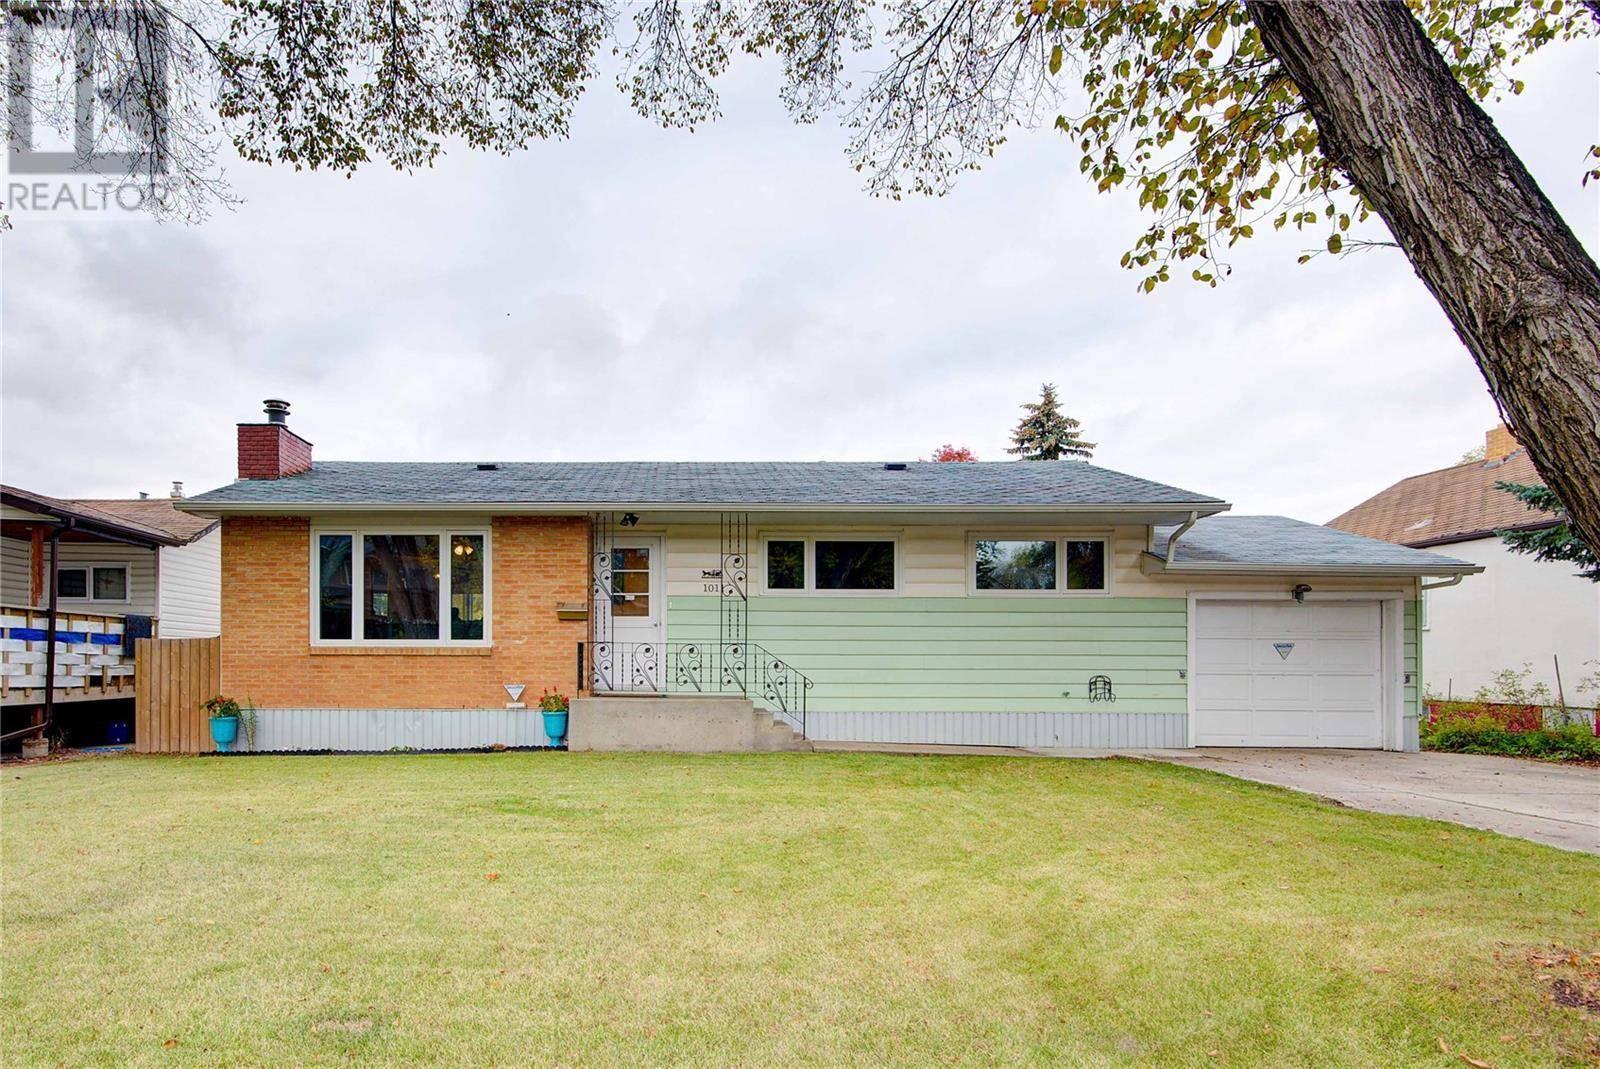 House for sale at 1011 K Ave N Saskatoon Saskatchewan - MLS: SK788290